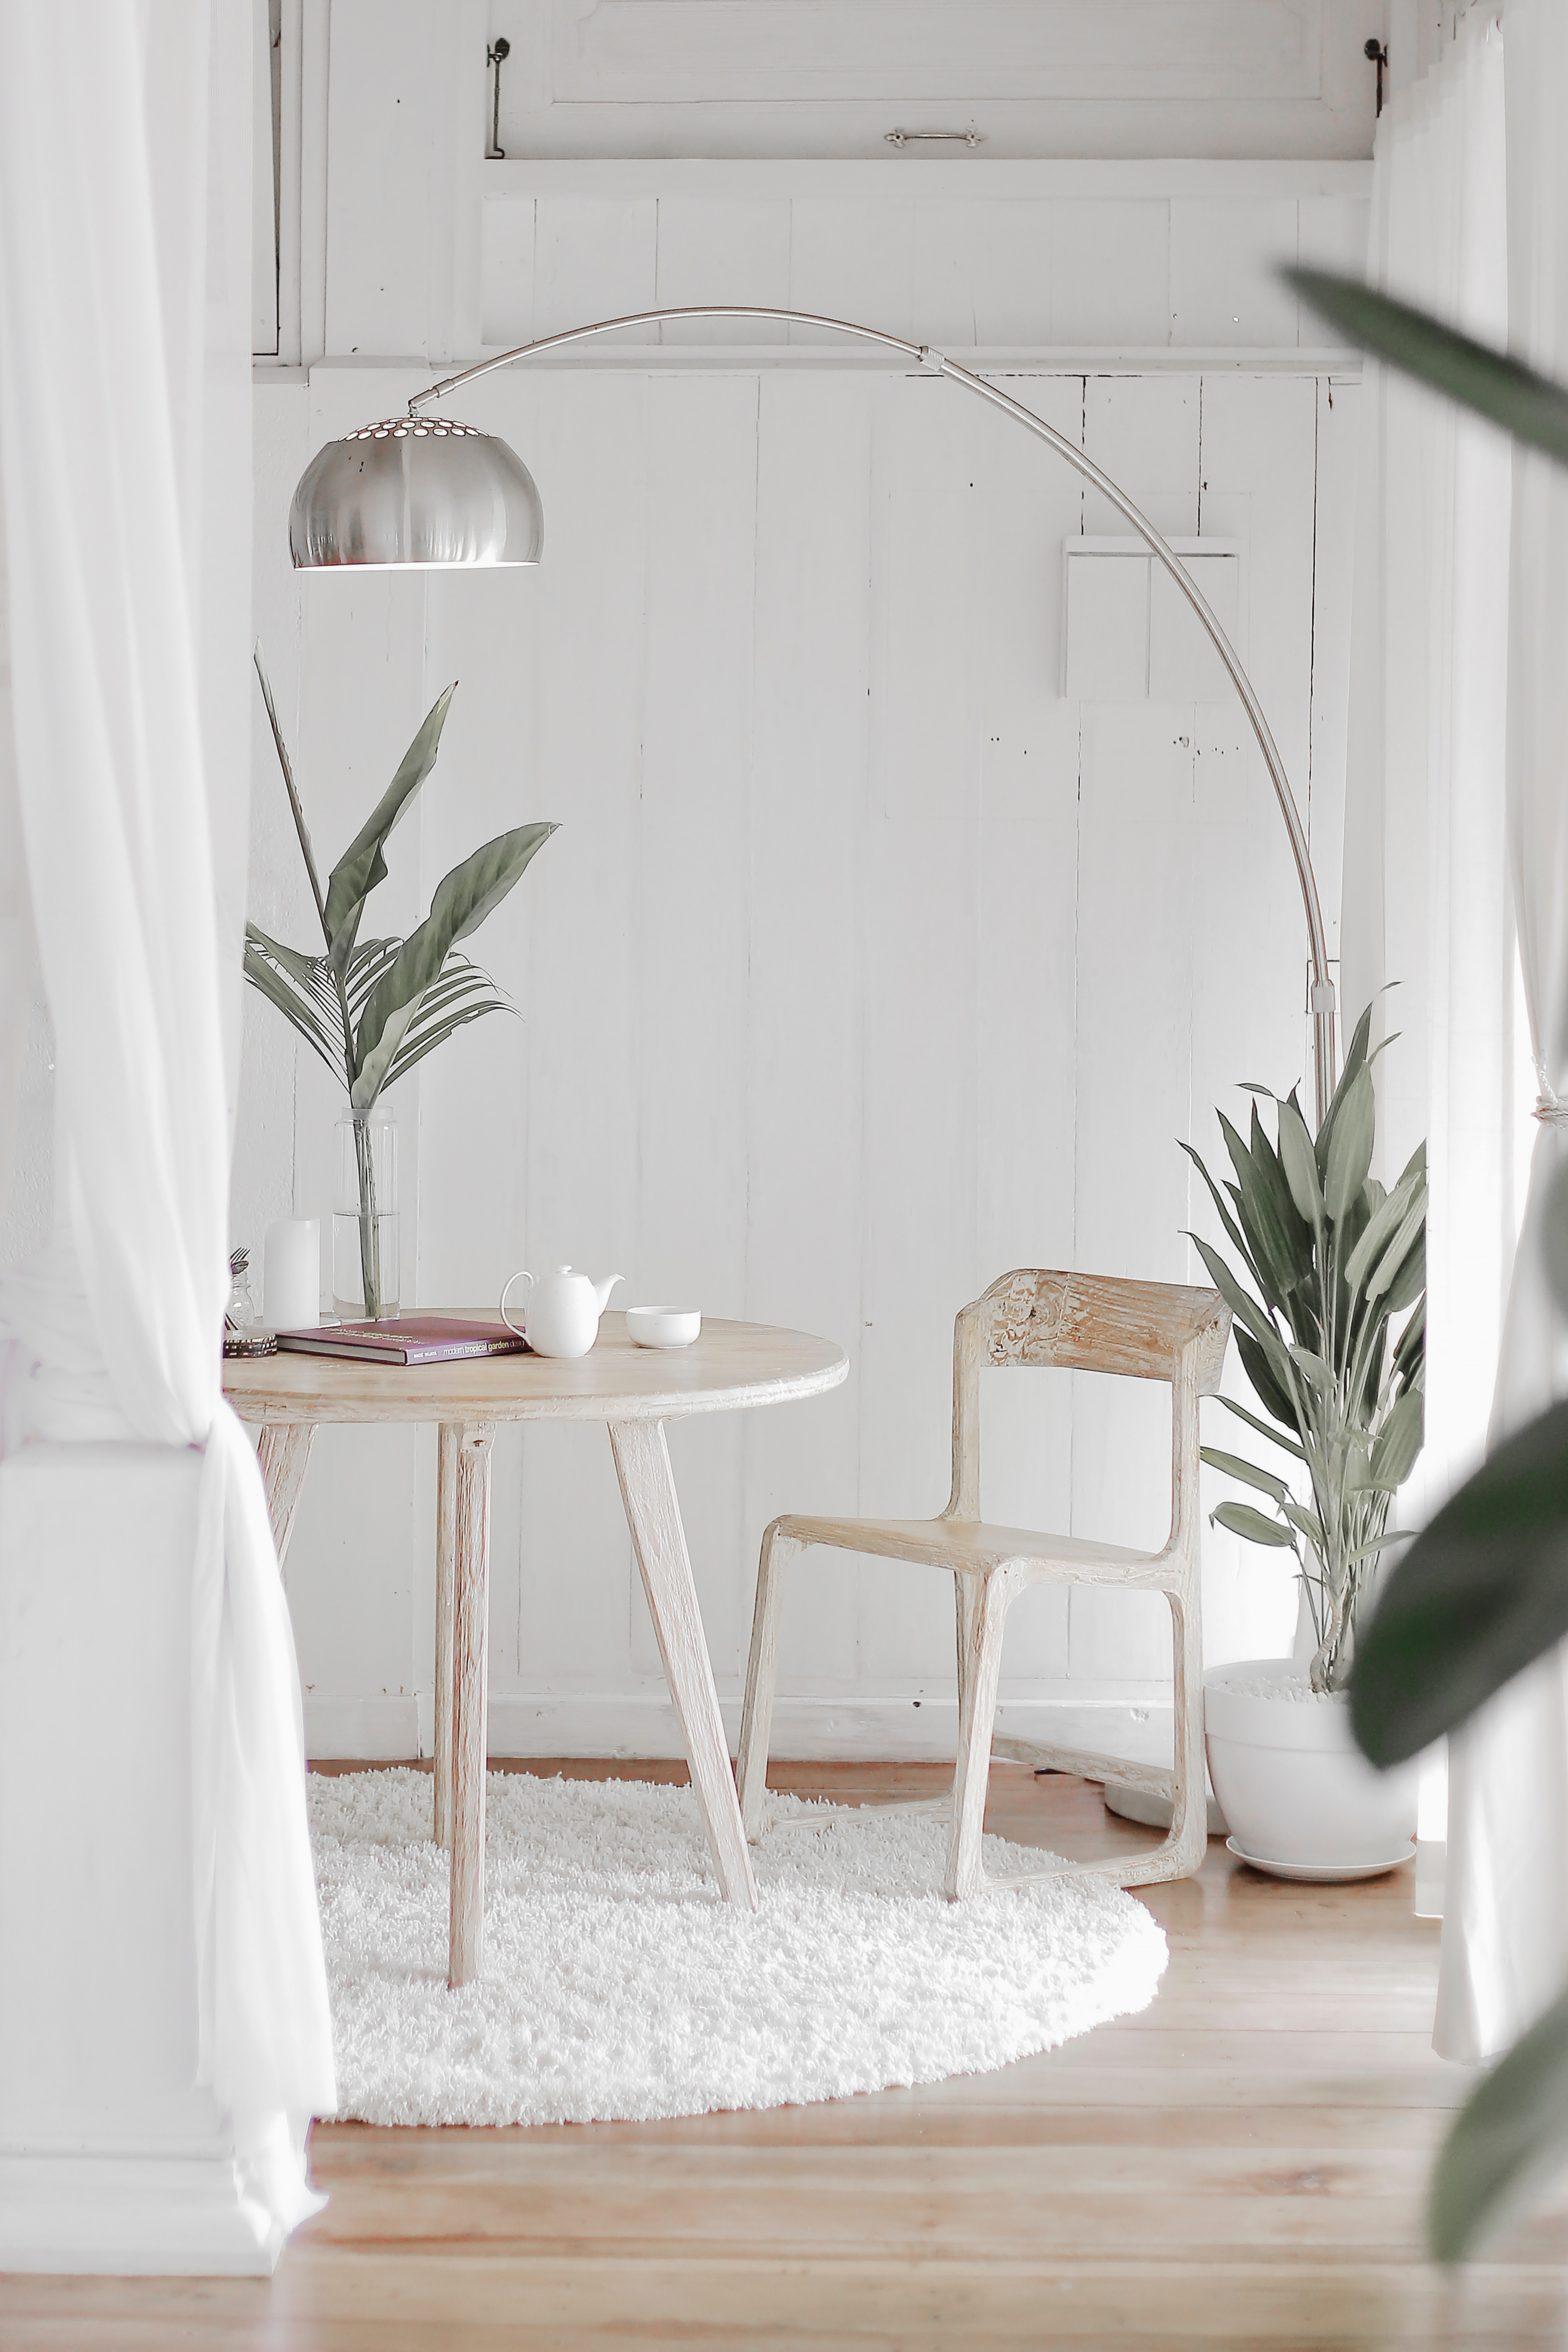 Le style minimaliste